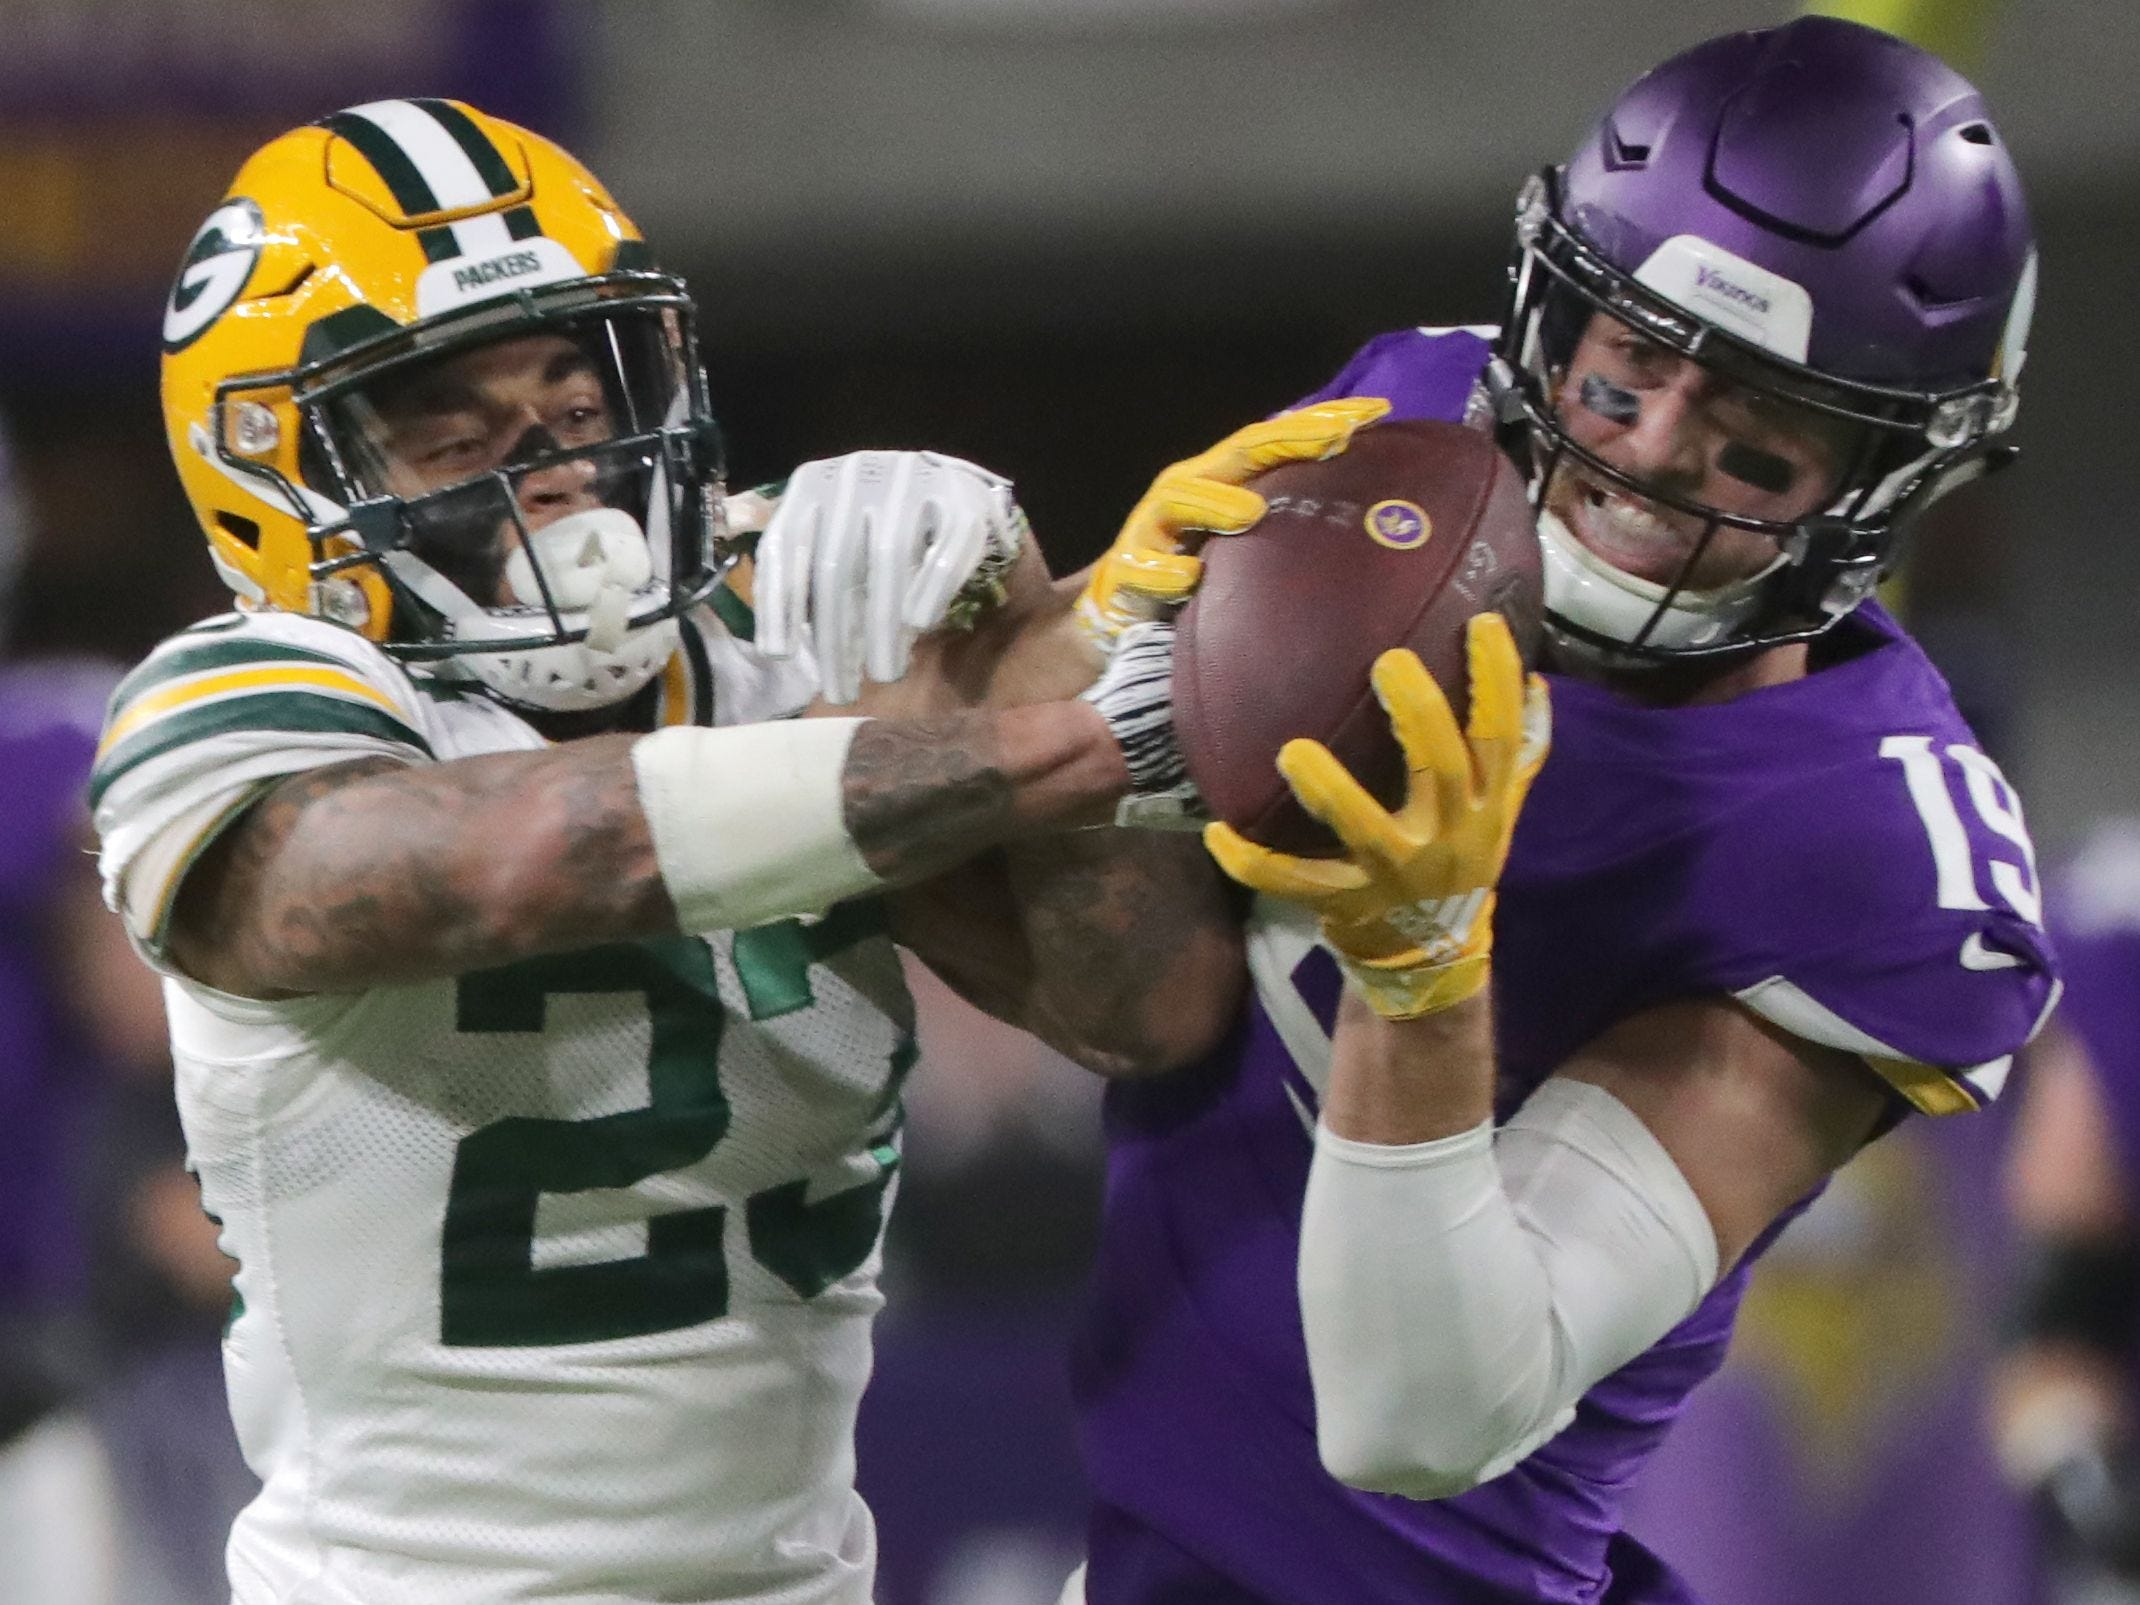 Week 16: Packers at Vikings, 7:15 p.m. CT Monday, Dec. 23, U.S. Bank Stadium (ESPN)